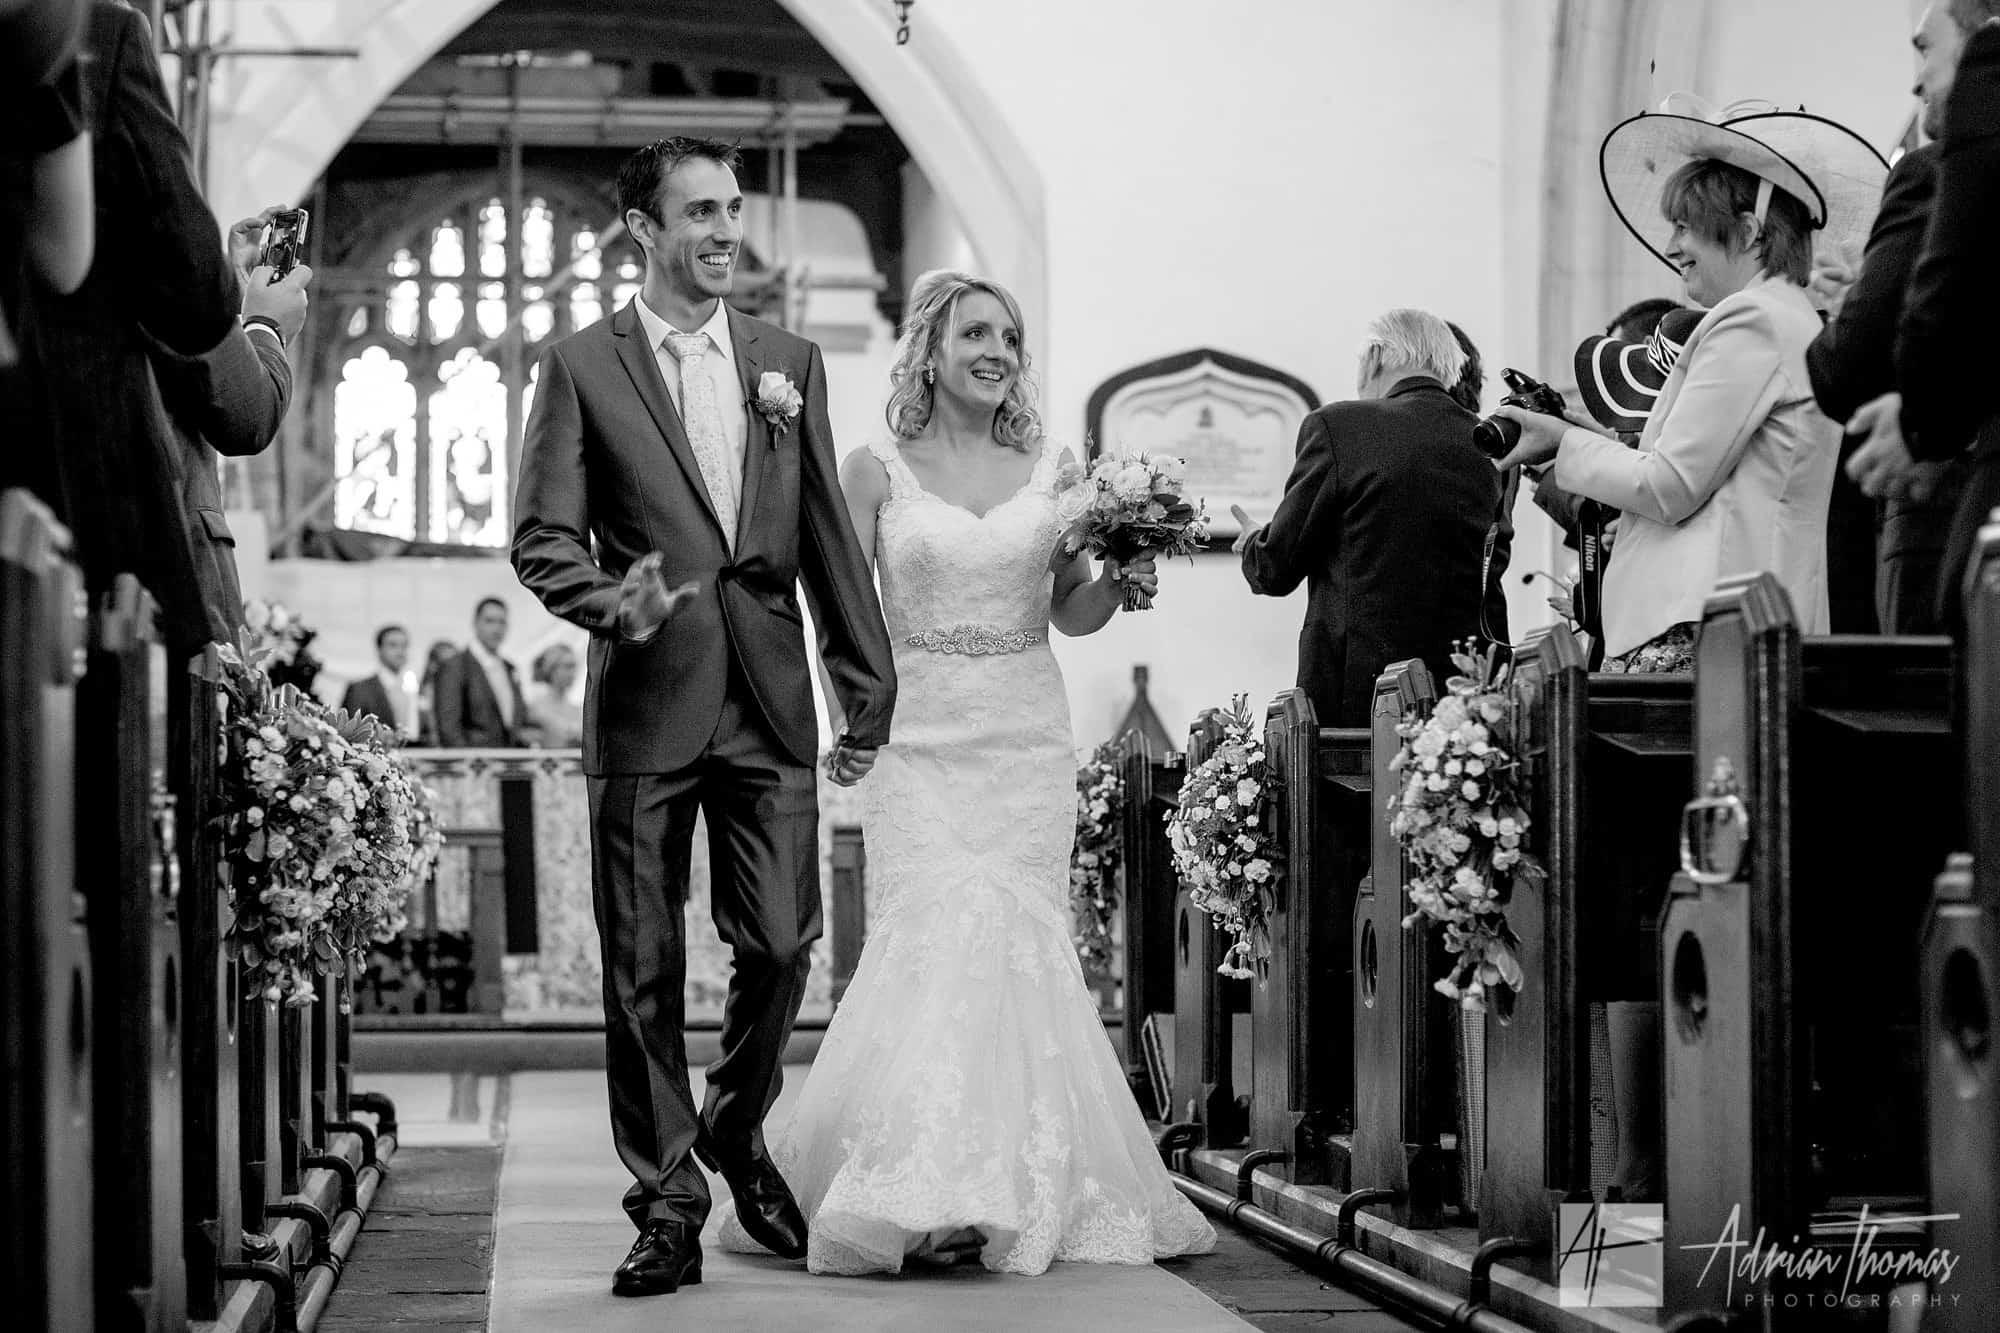 Bride and groom walking down isle after wedding.